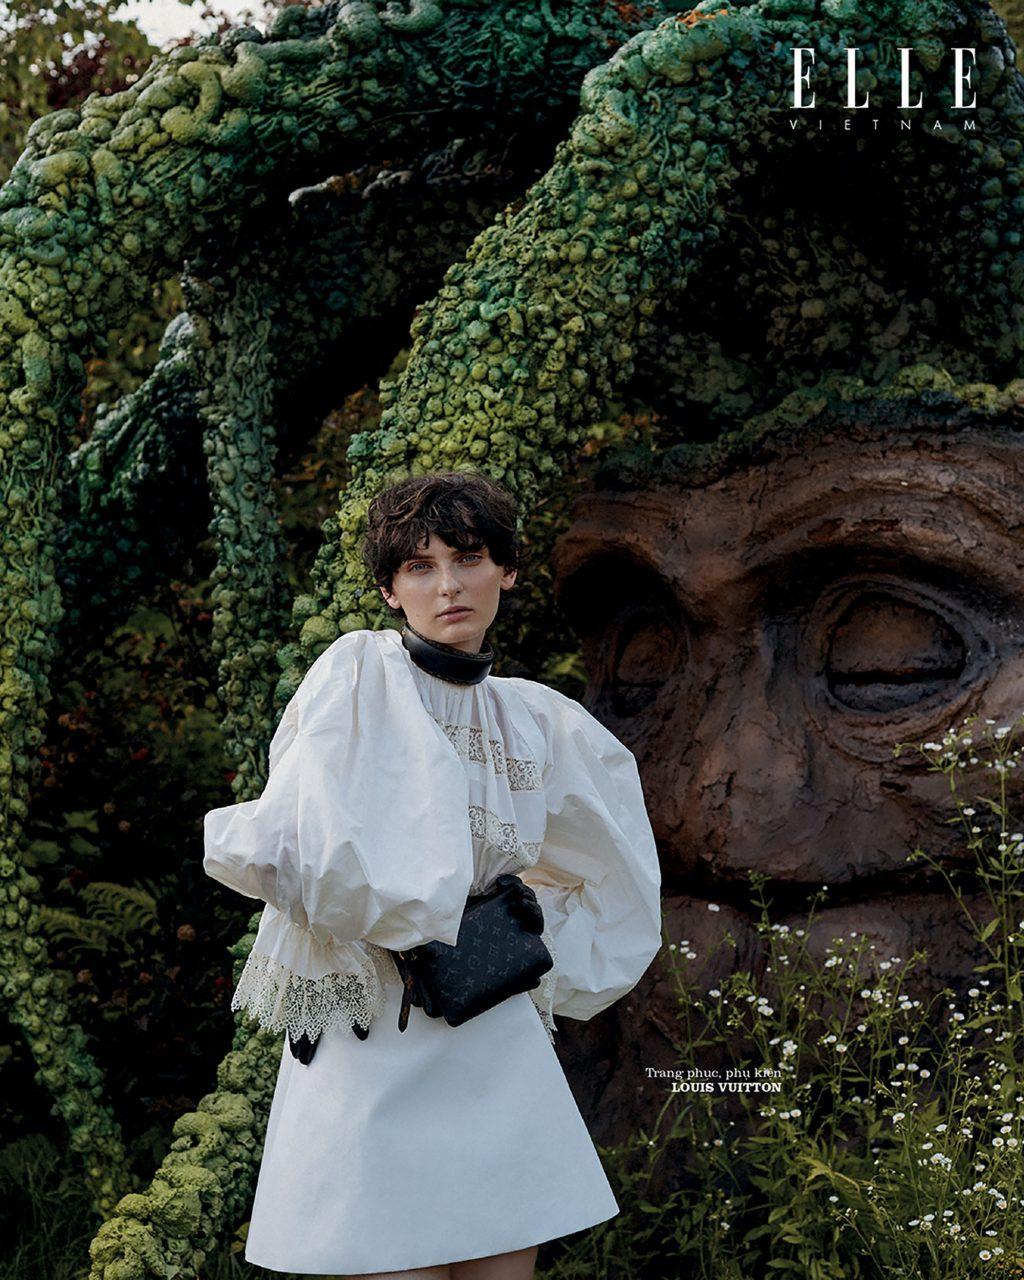 bộ ảnh thời trang wonderland trang phục Louis Vuitton